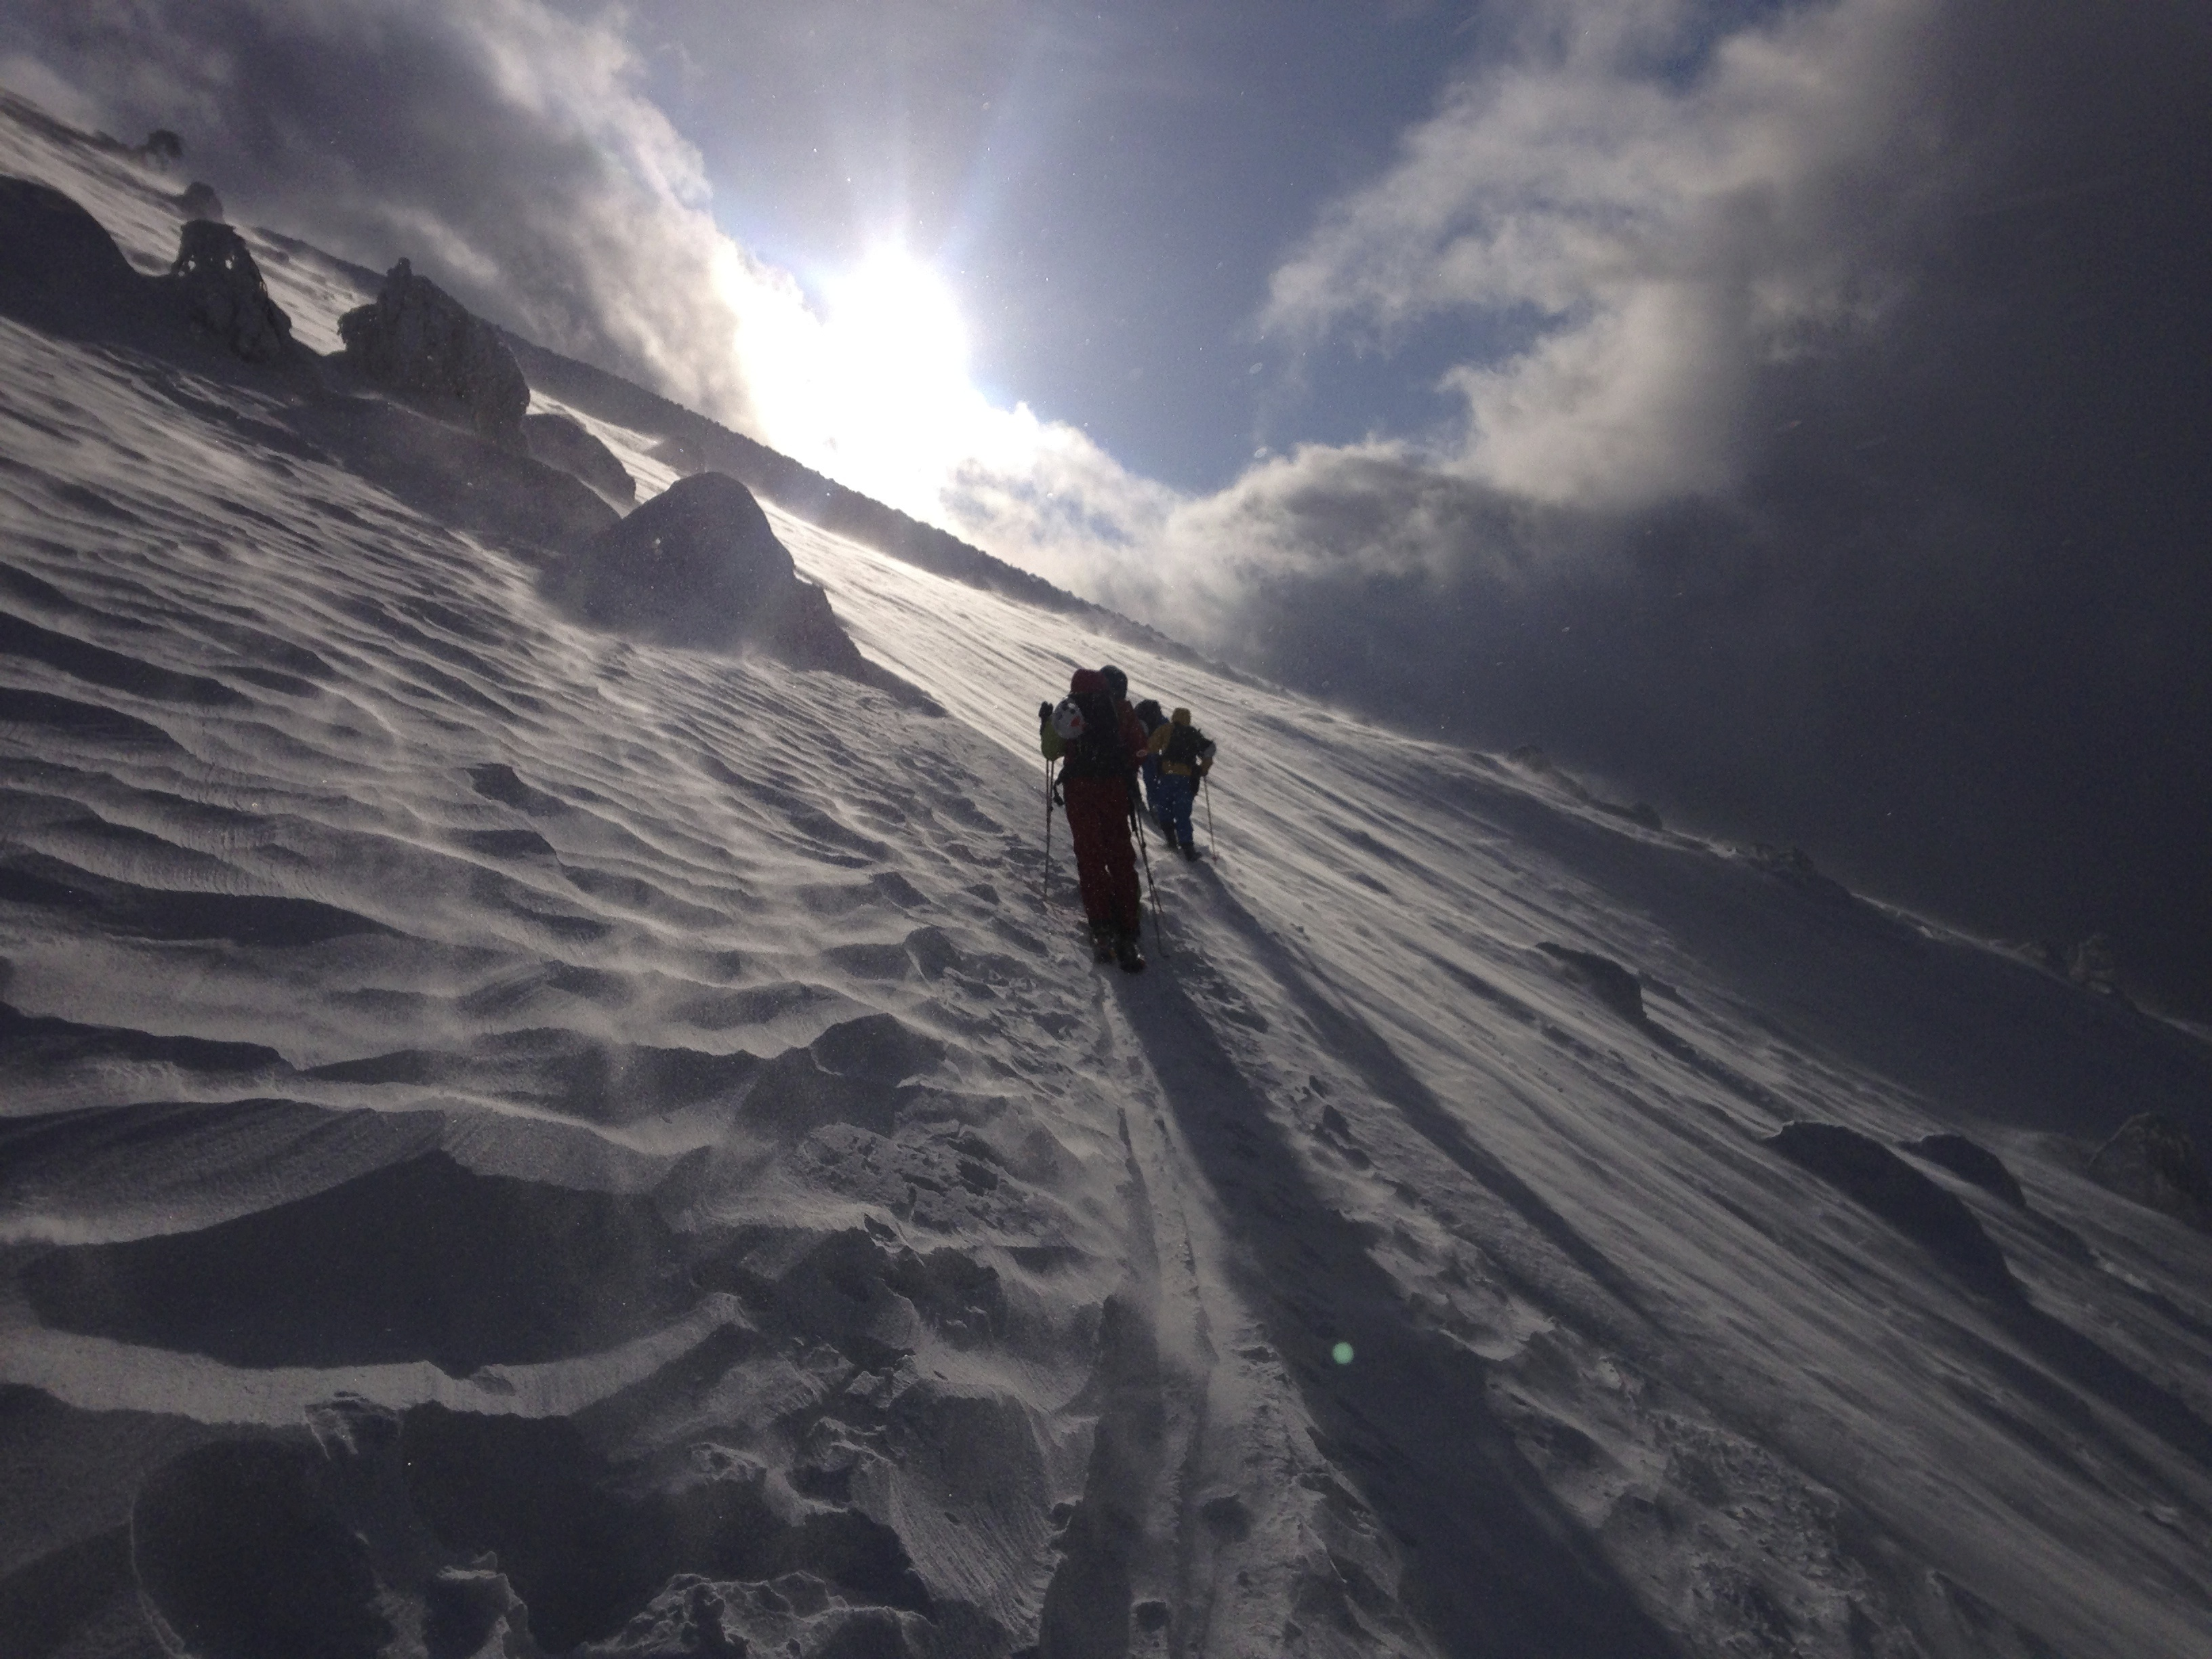 Hiking up Mt Yotei in Hokkaido